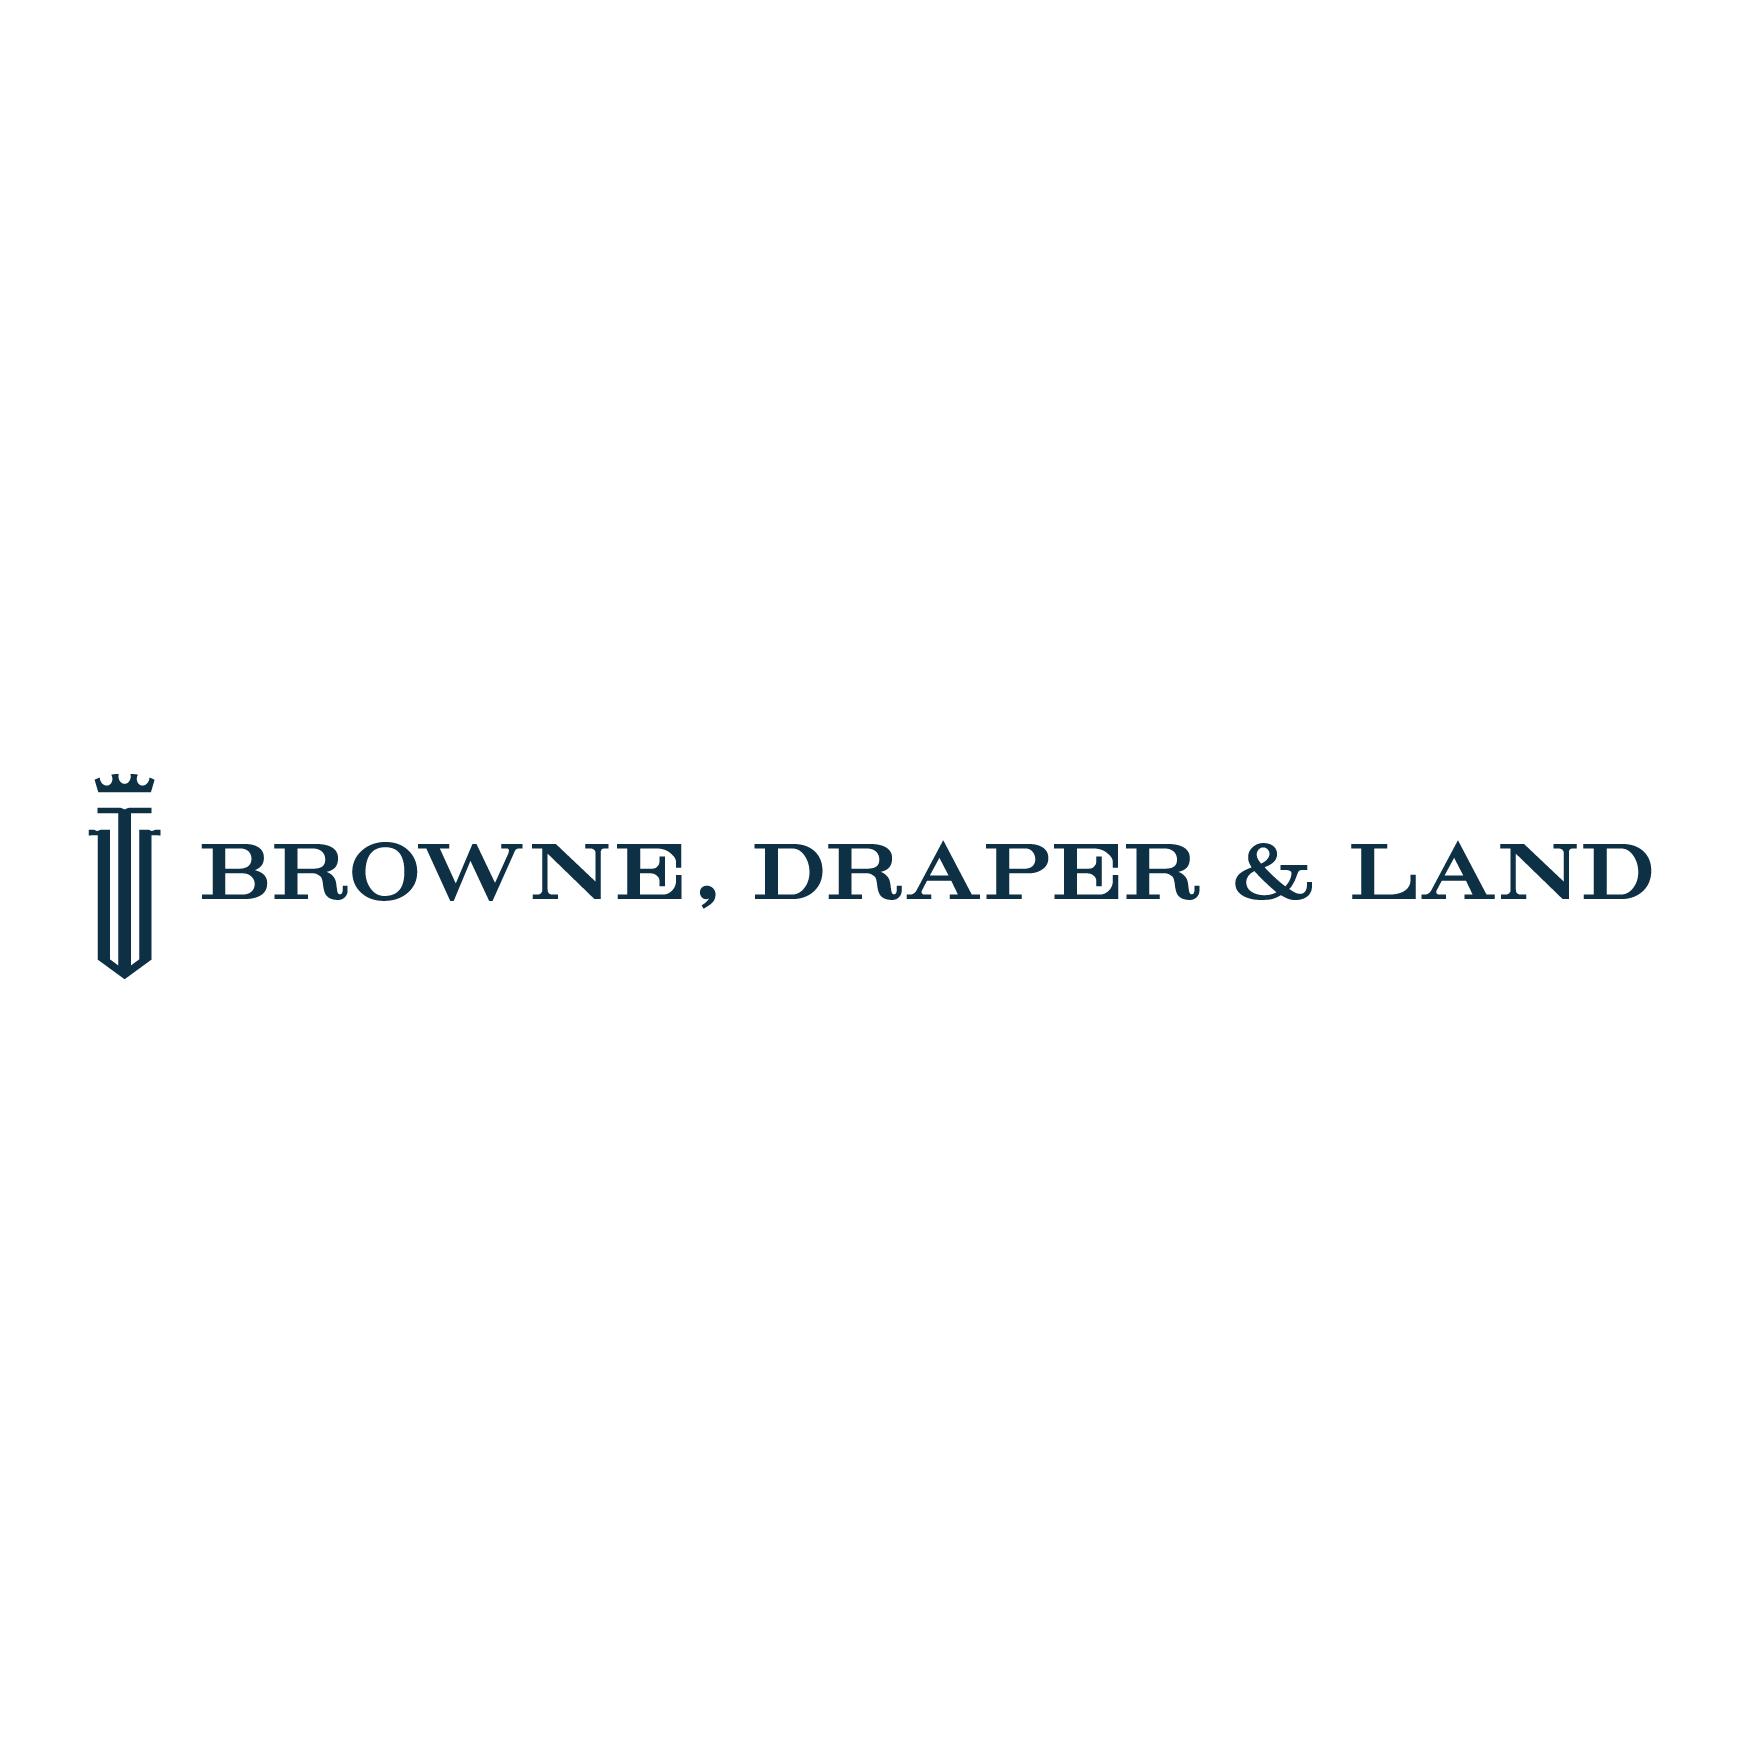 Browne, Draper, & Land Financial Concepts